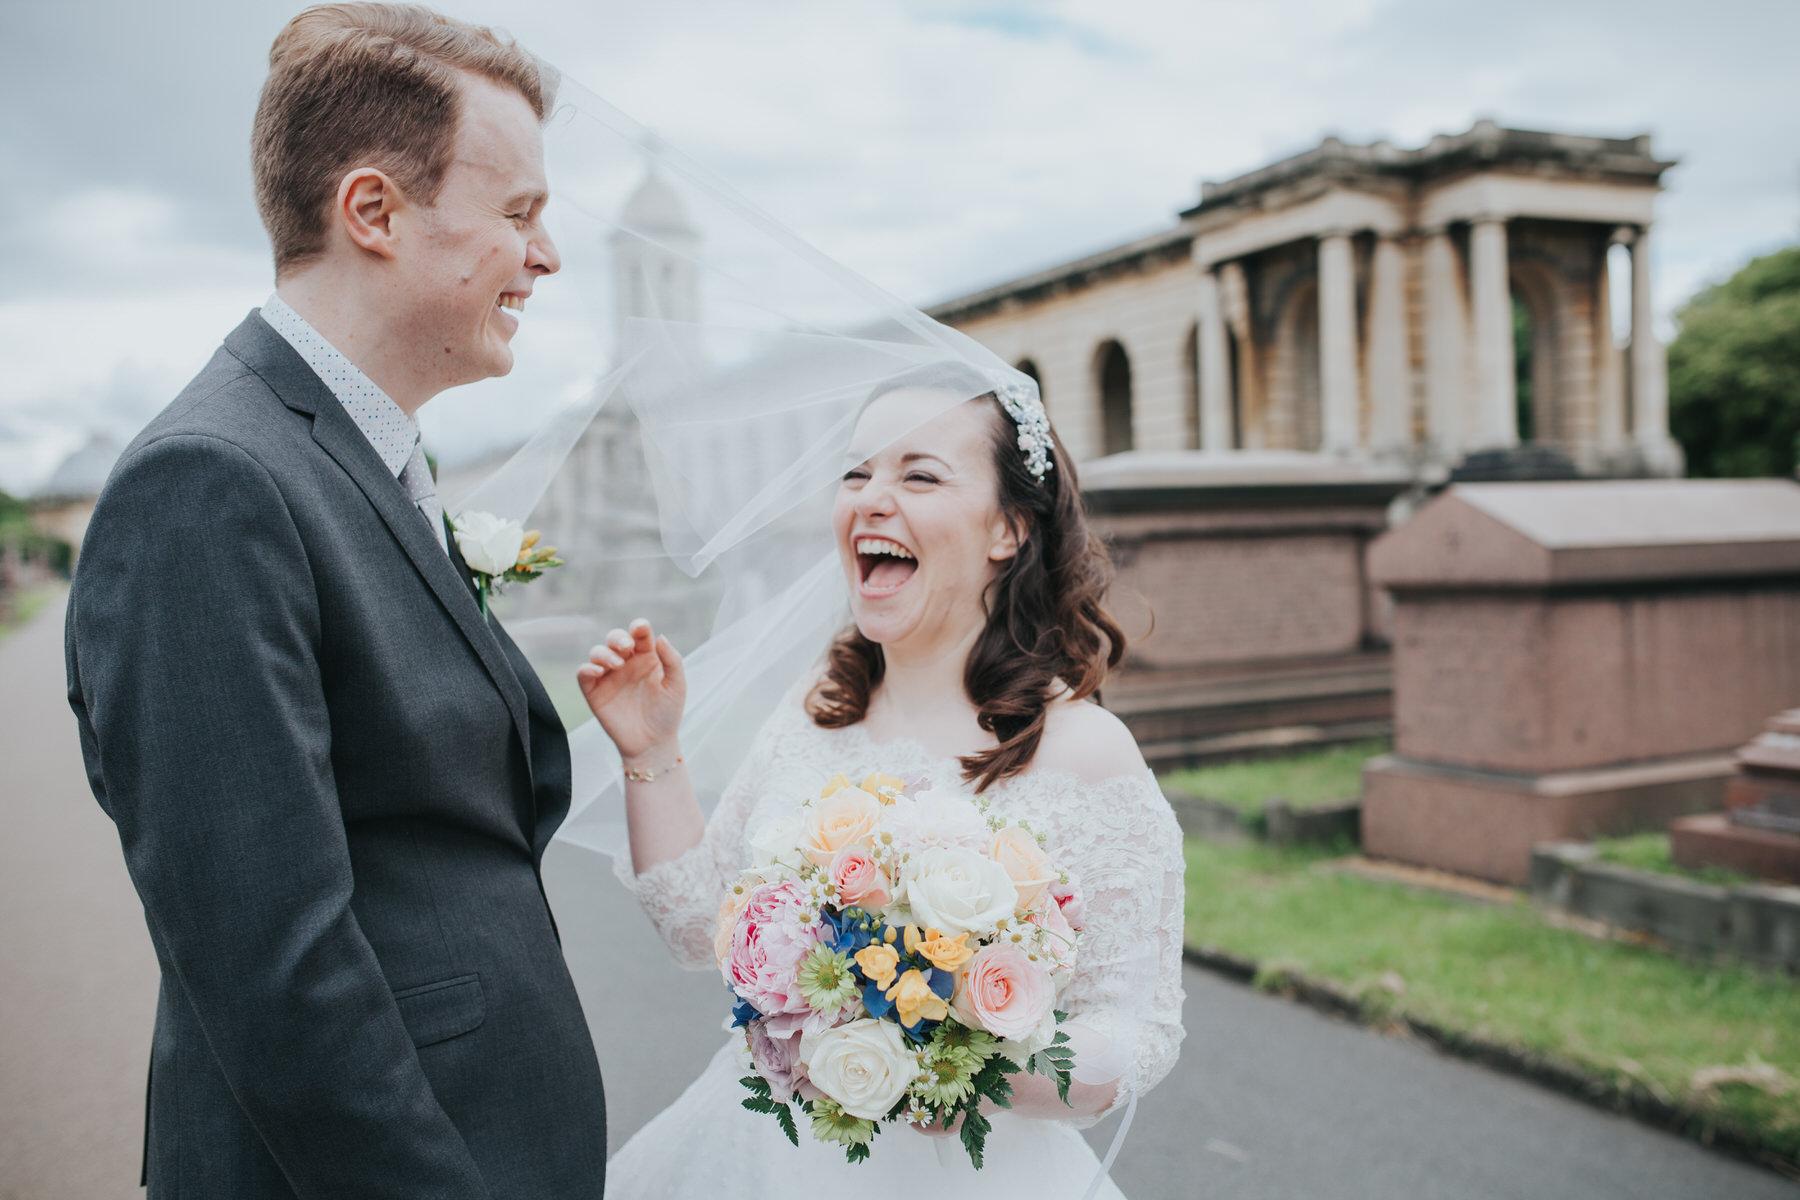 flyaway veil wedding portraits Brompton Cemetery.jpg